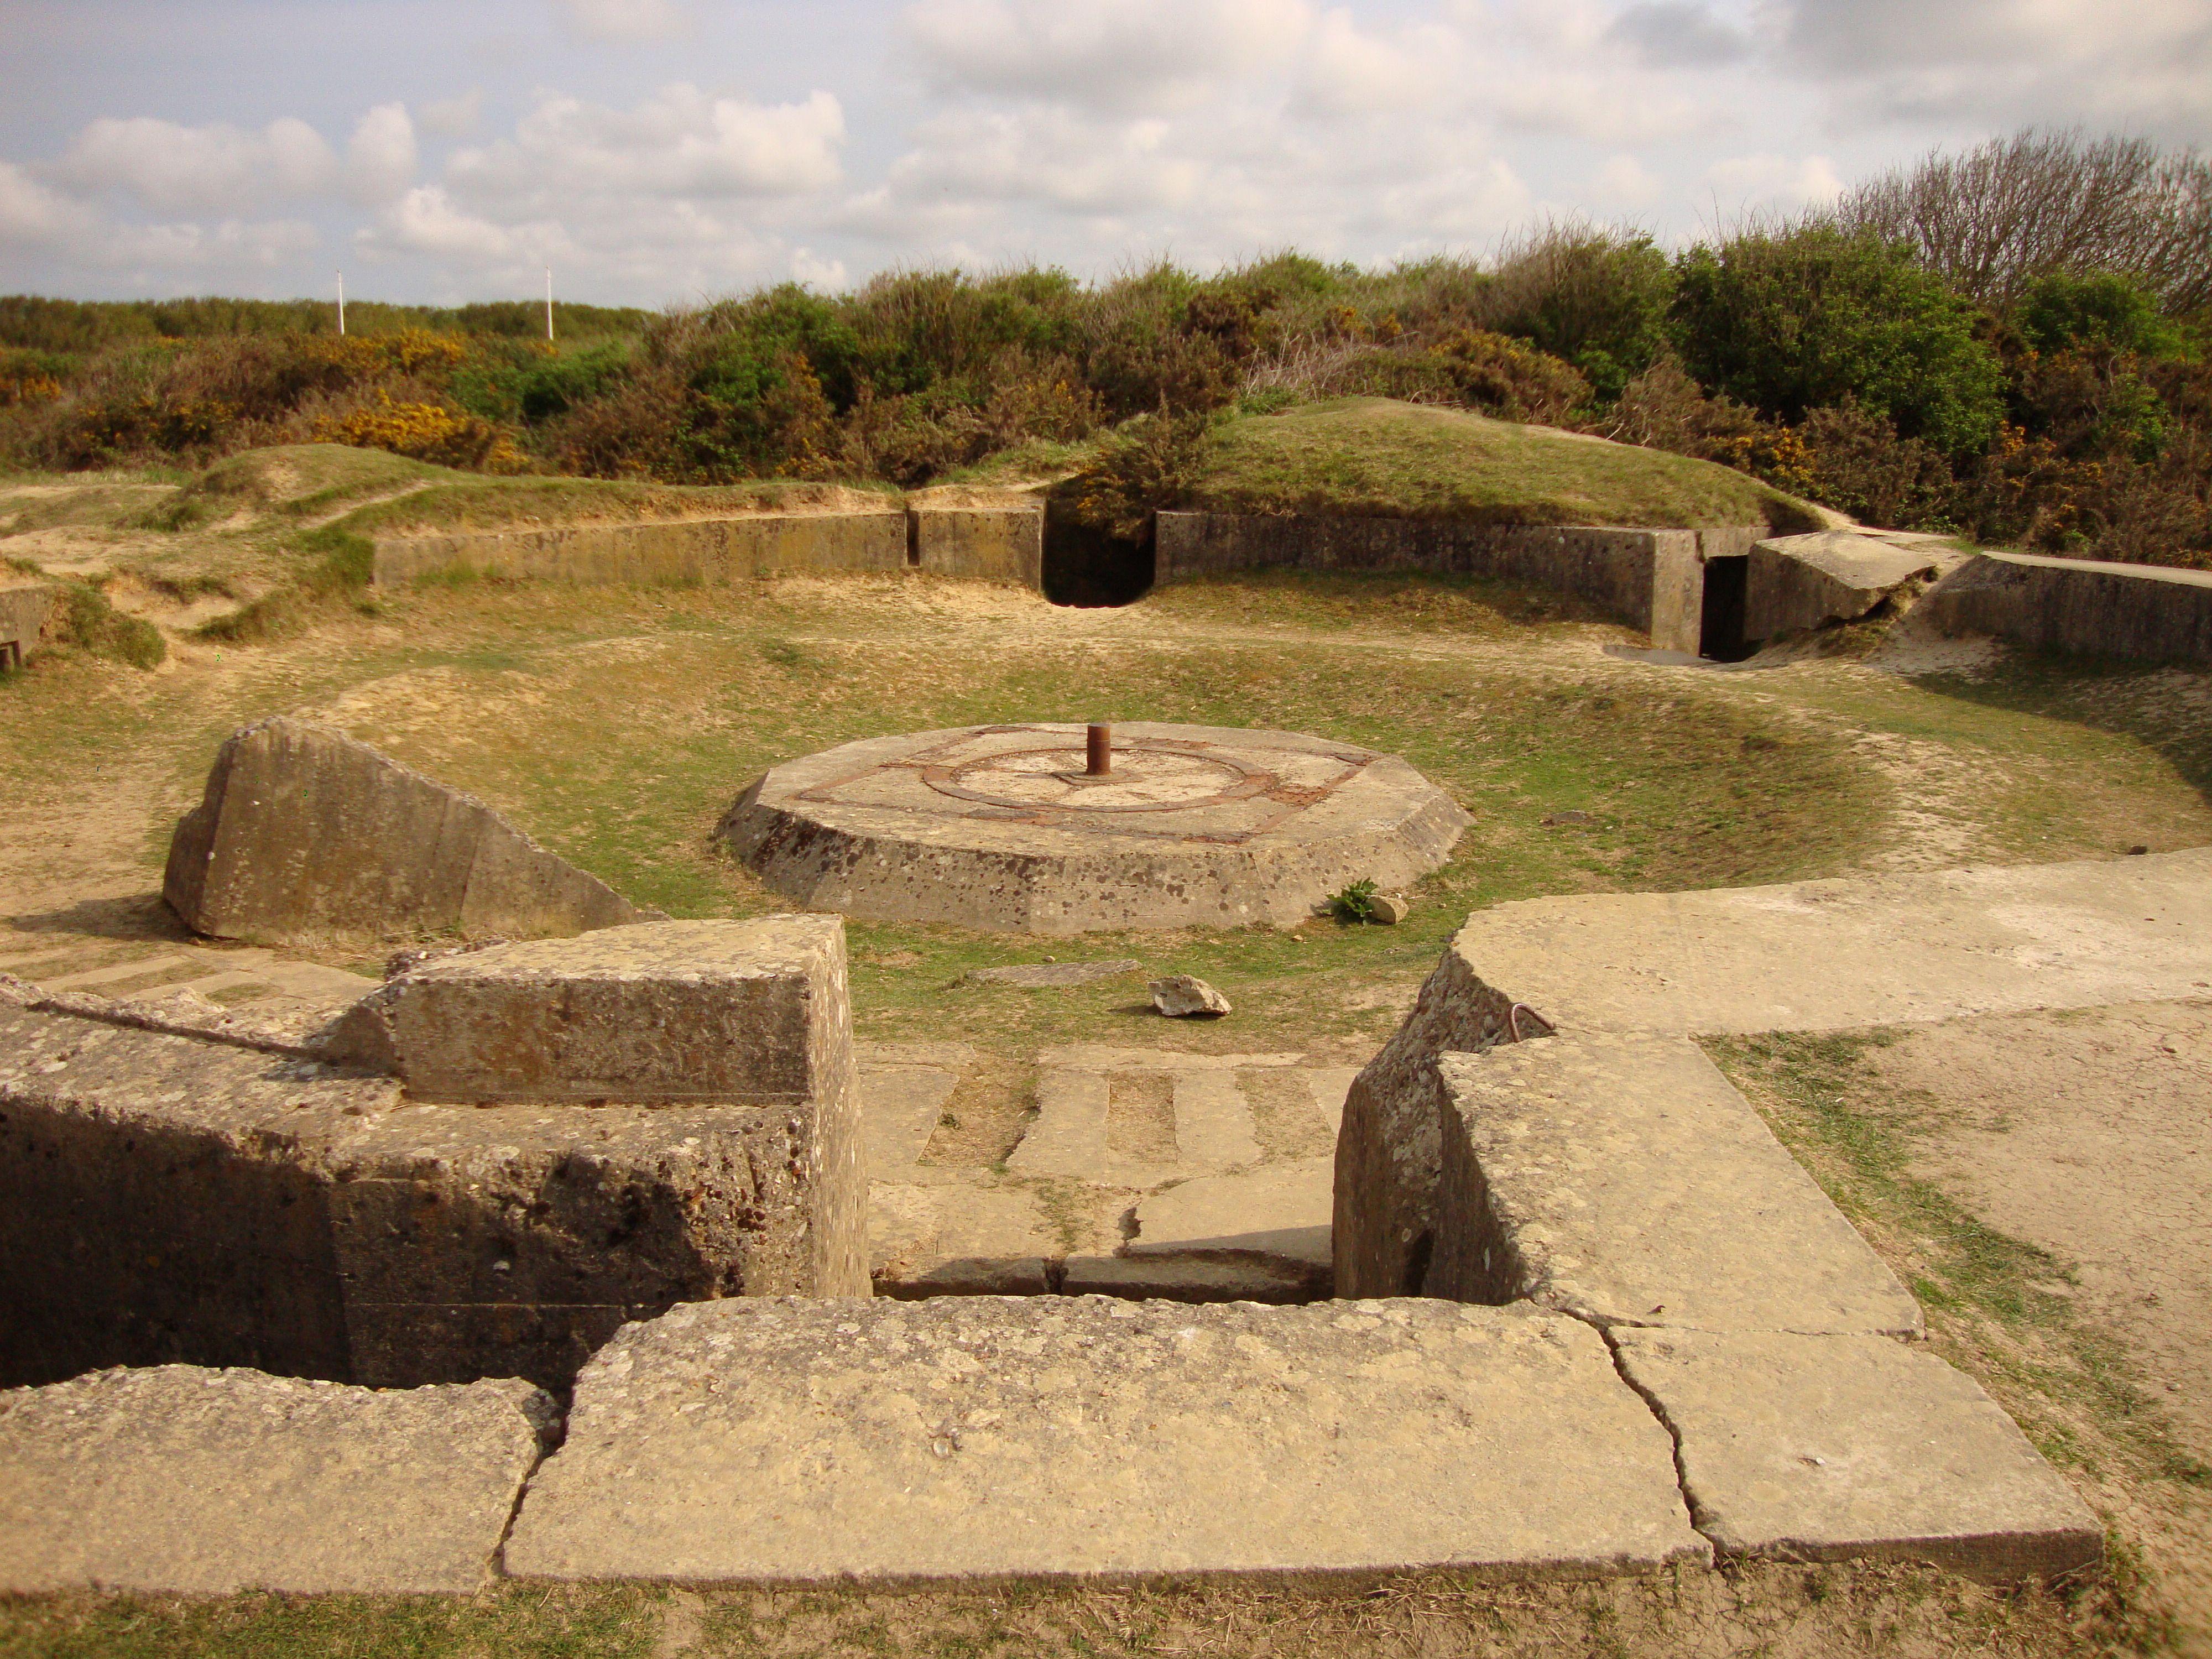 Pointe du Hoc German bunker